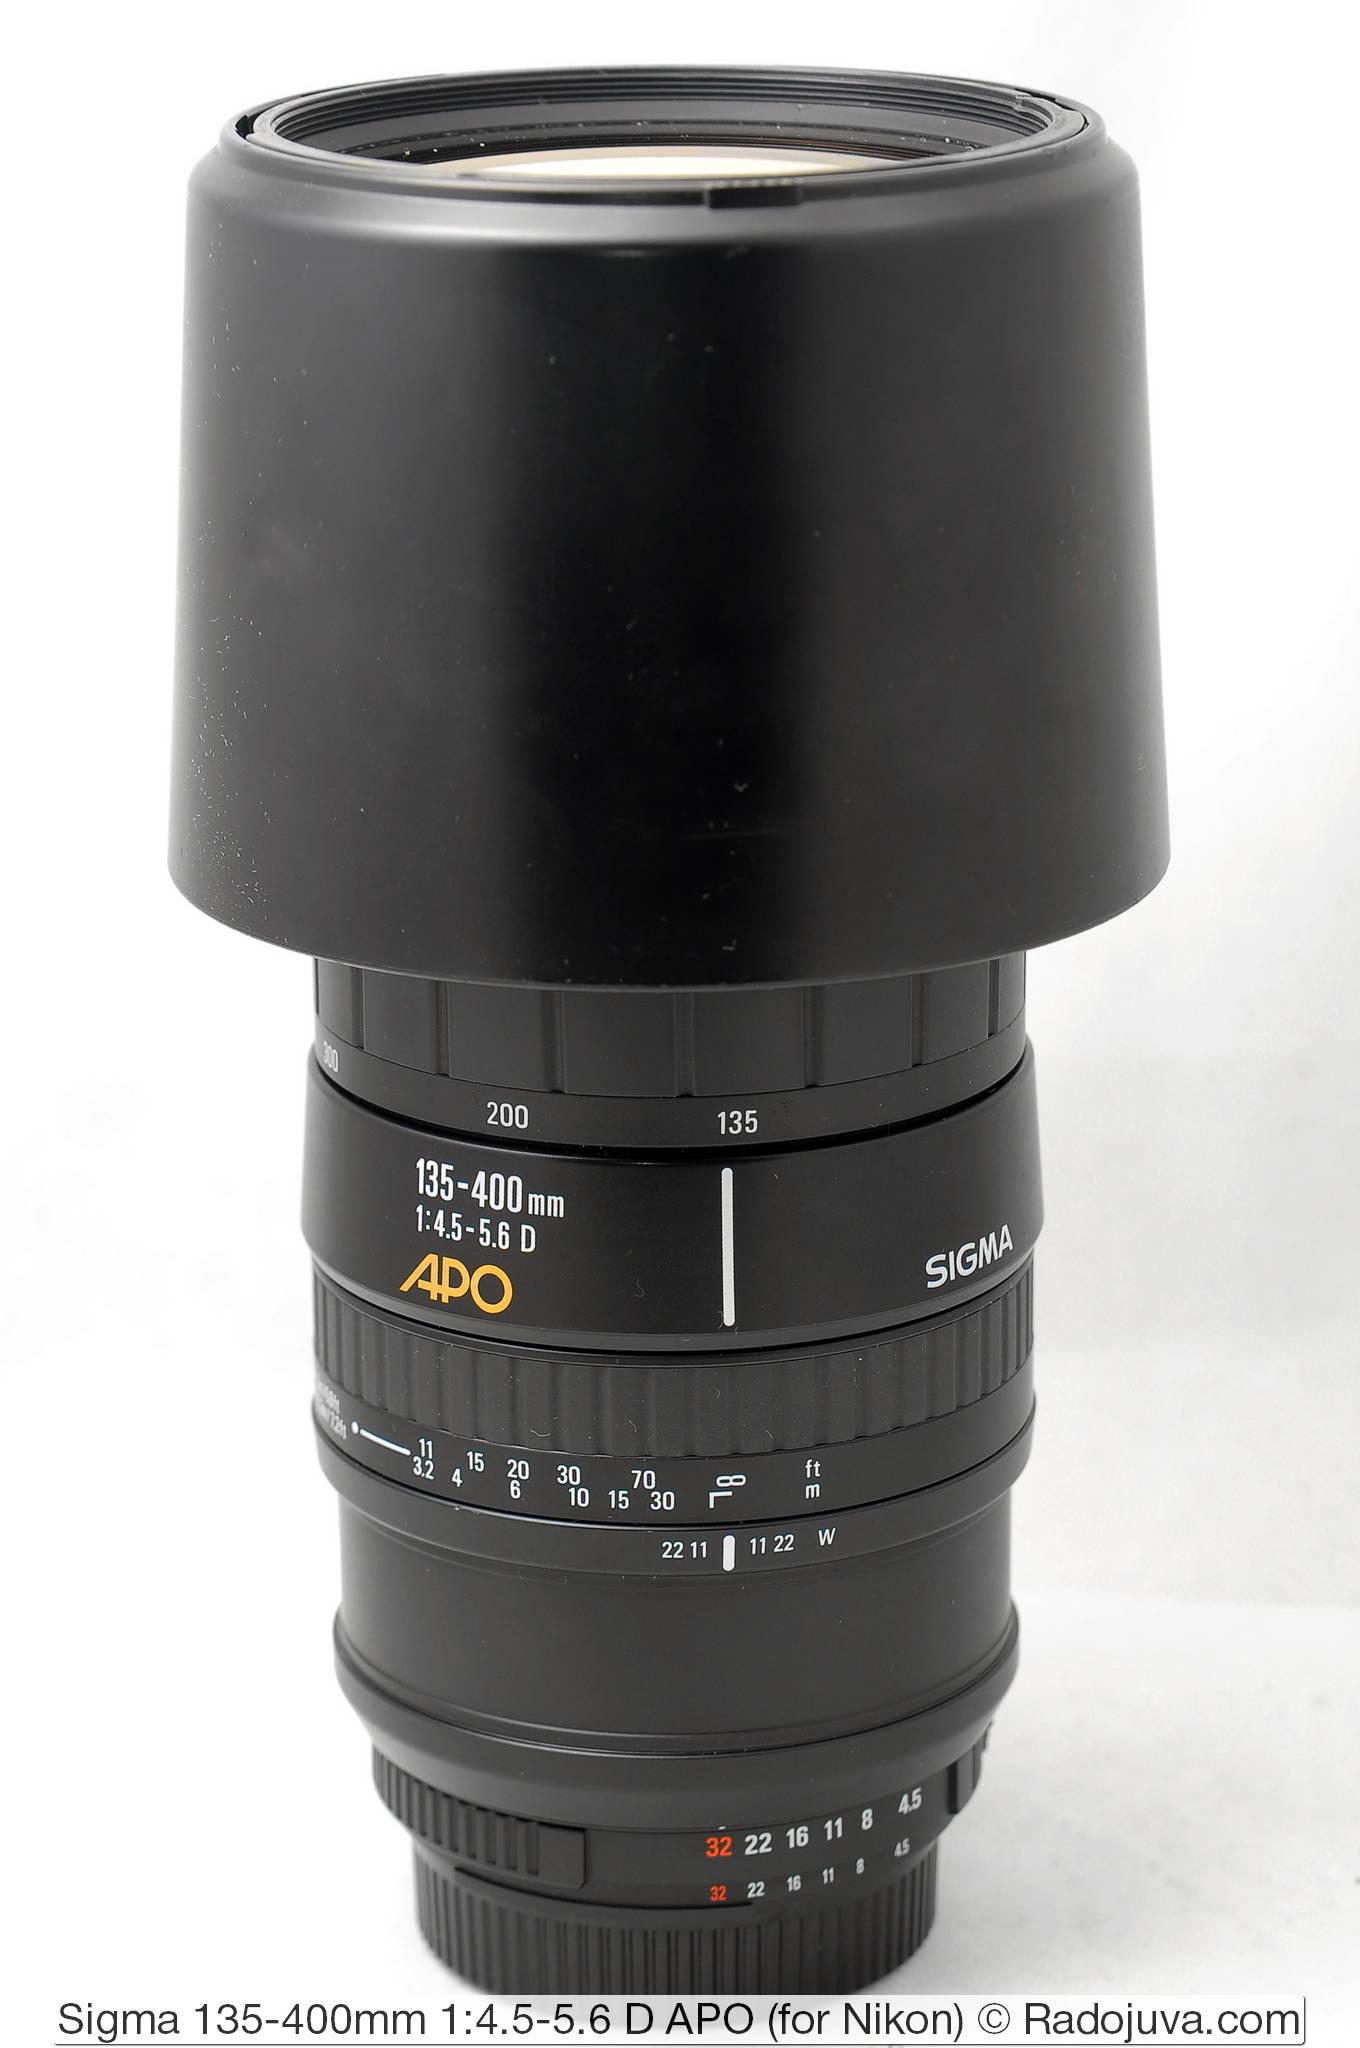 Sigma 135-400/4.5-5.6